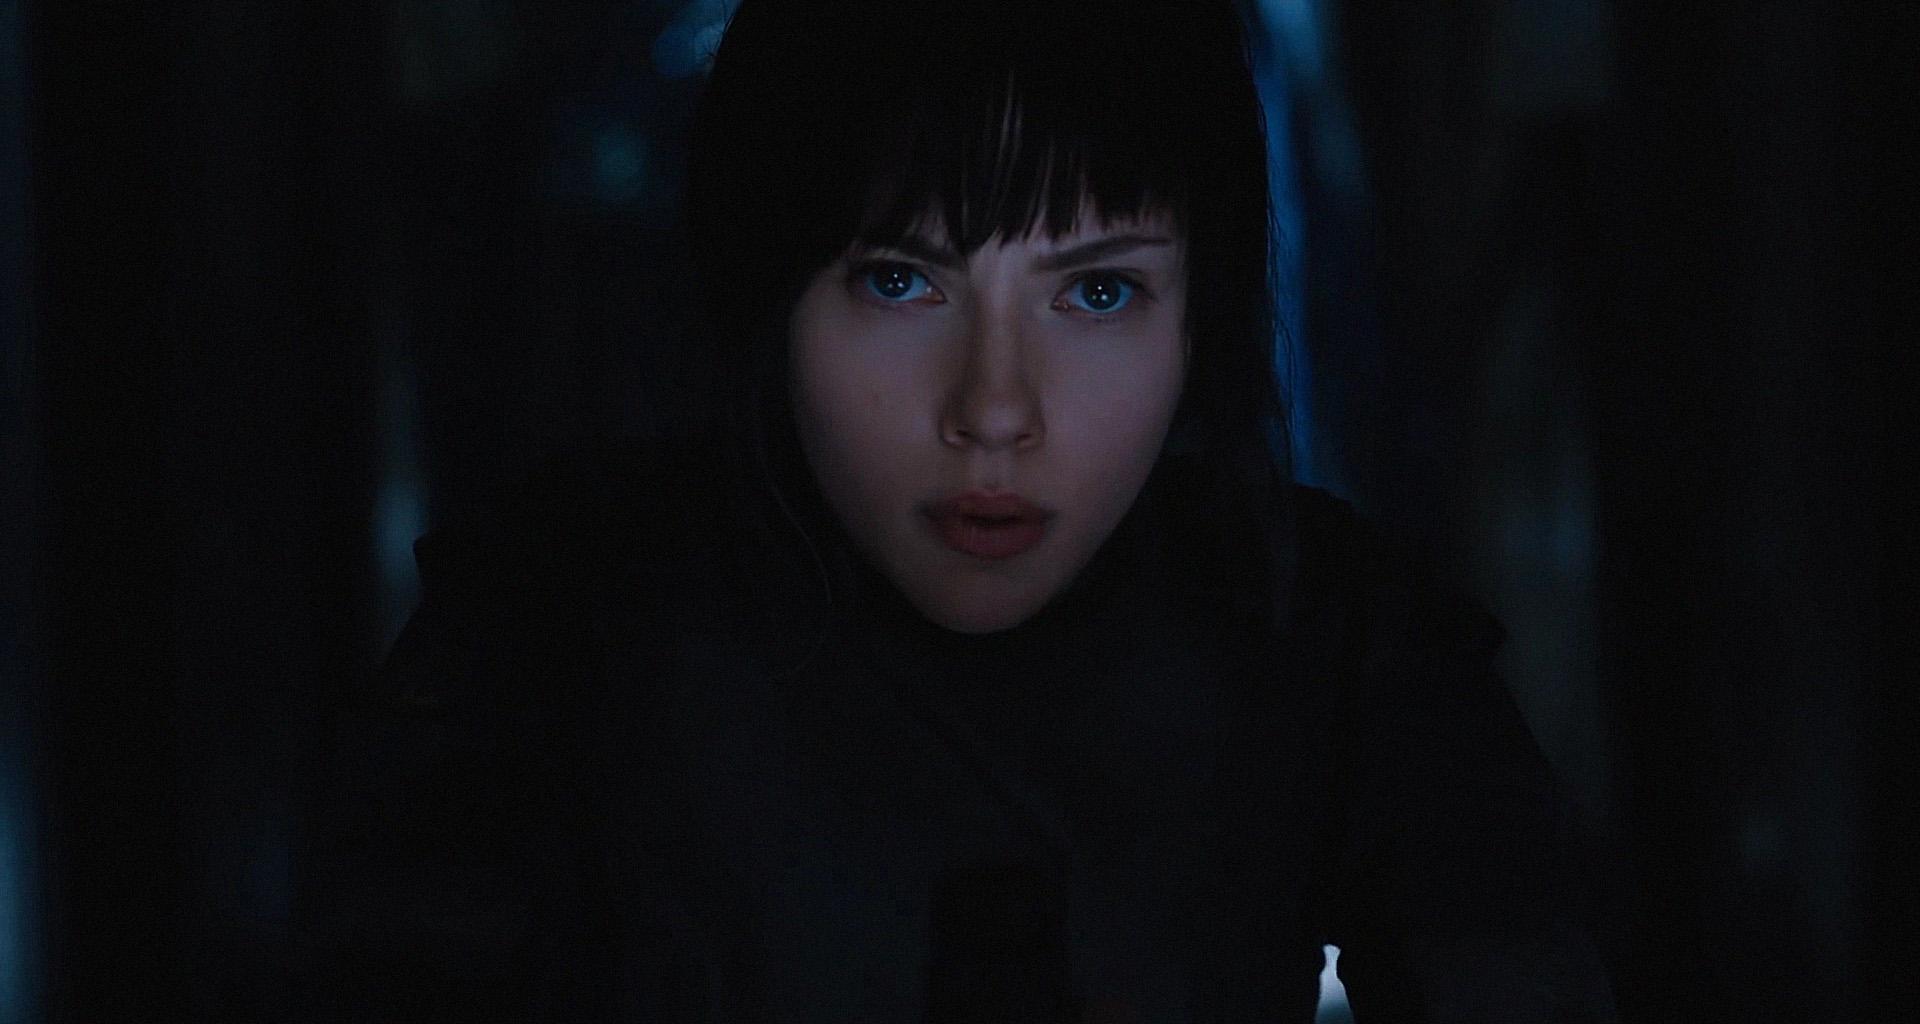 Ghost In The Shell Screencaps Starring Scarlett Johansson Movie